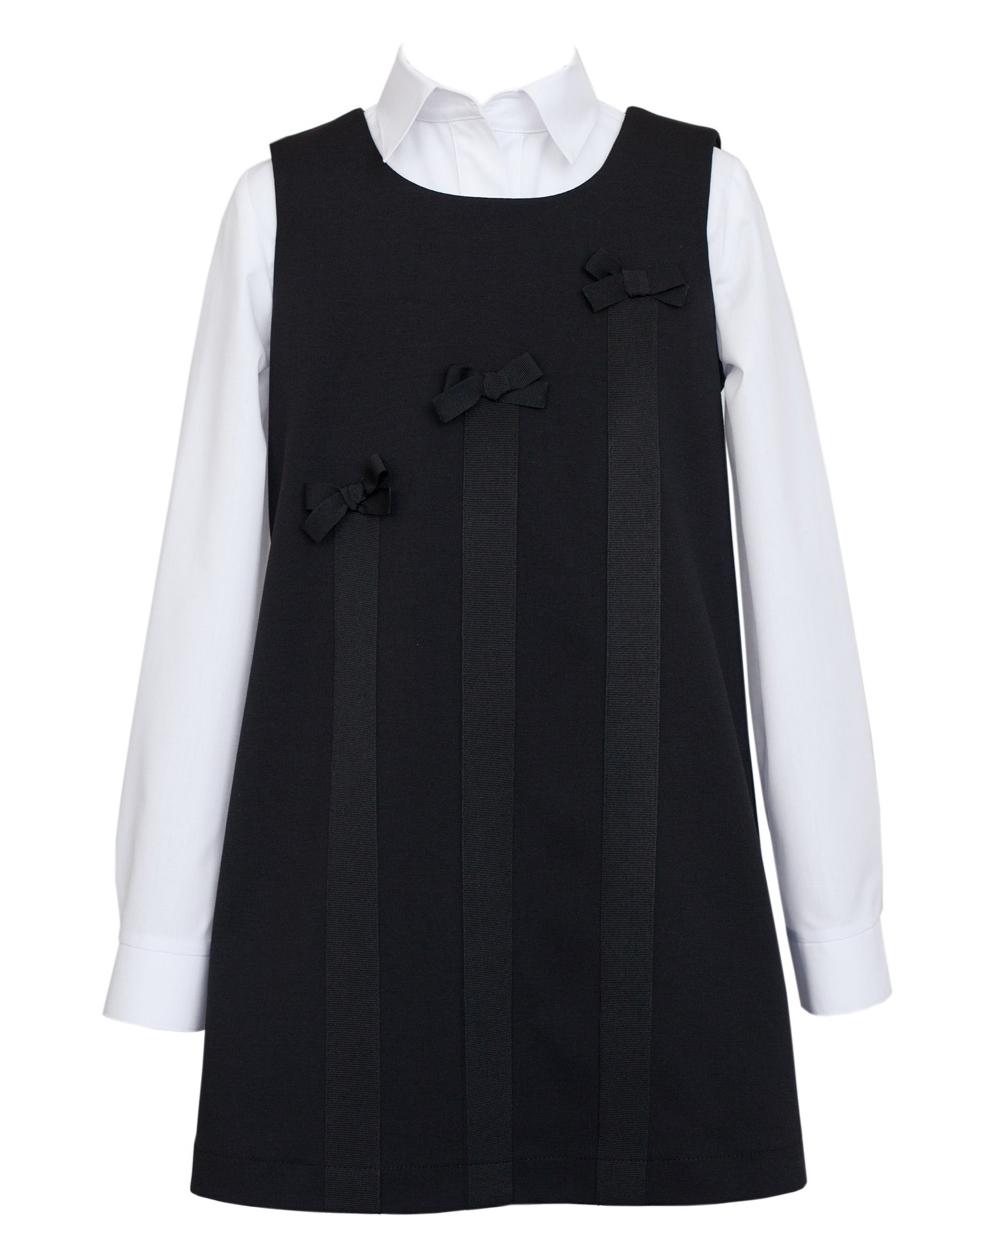 a4ef2f3910 Elegancka sukienka dzianinowa 122-152 201 SZK czarna